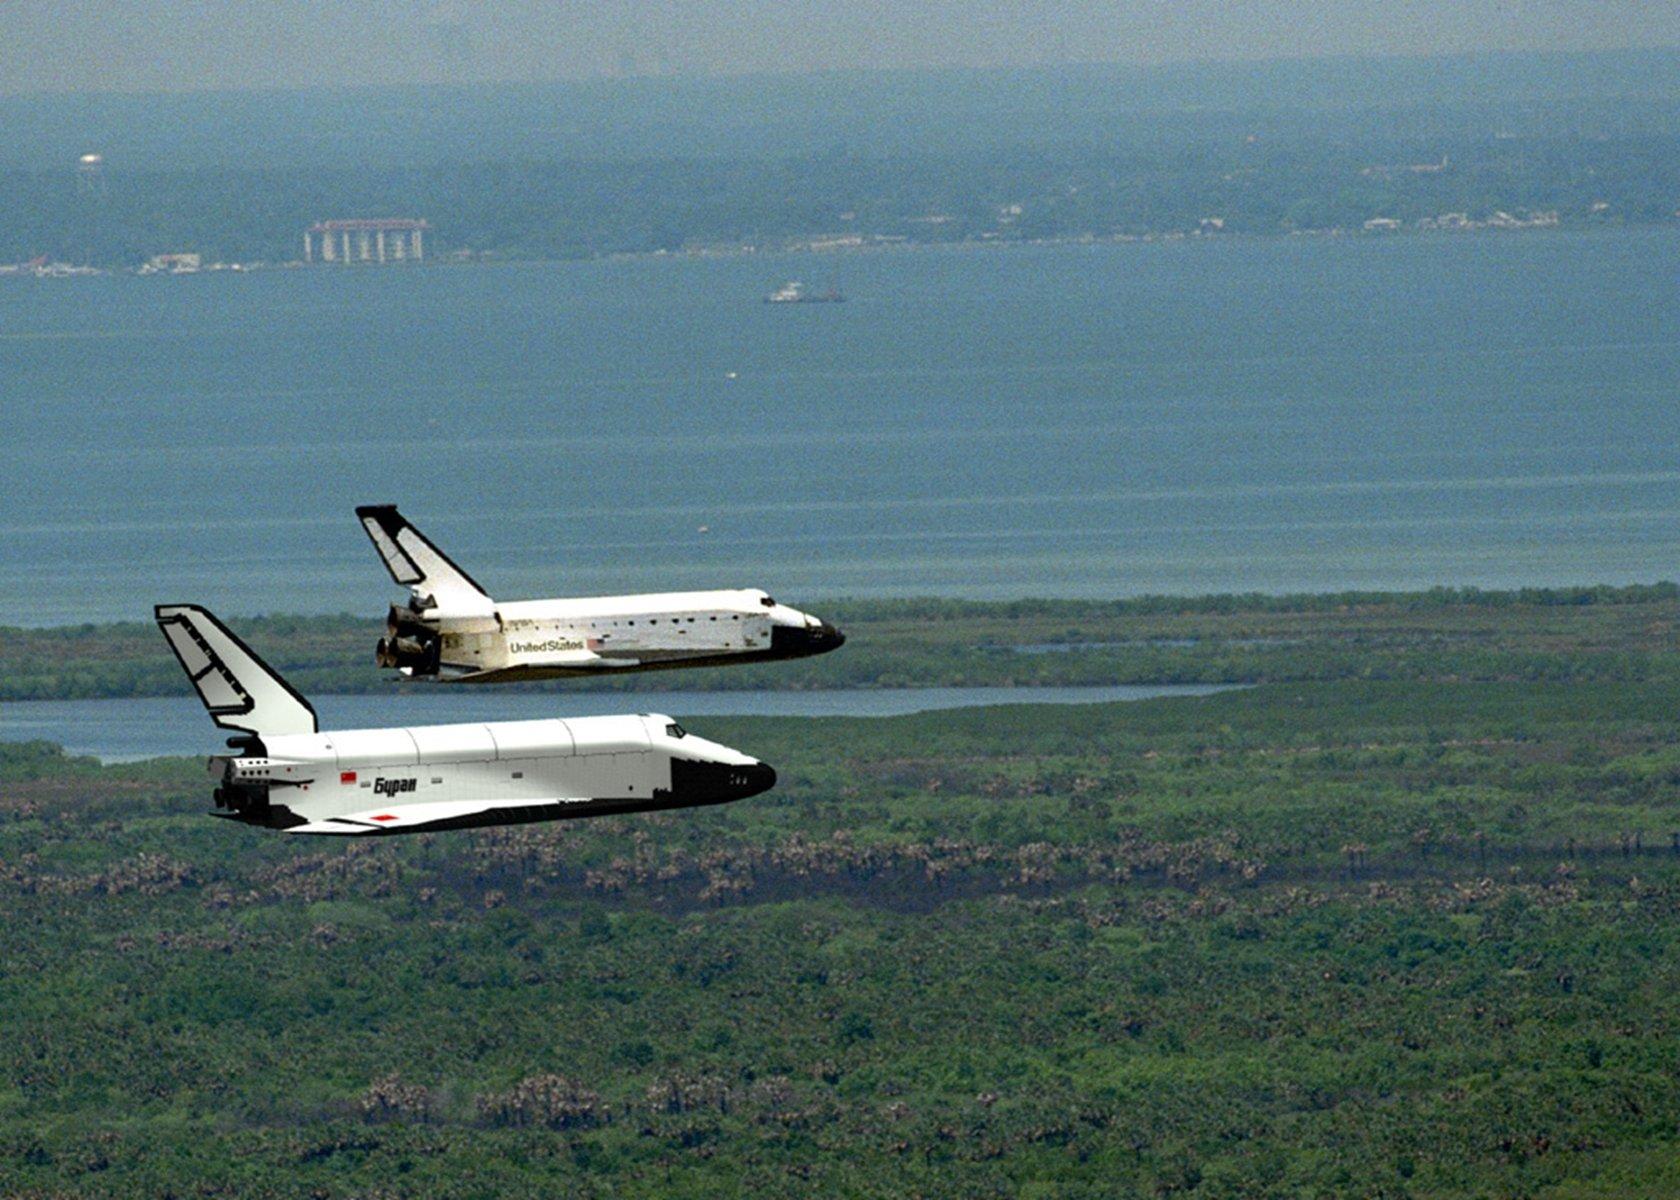 Space Shuttle Buran Russian Space Cccp Urrs Soviet Vkk Nasa